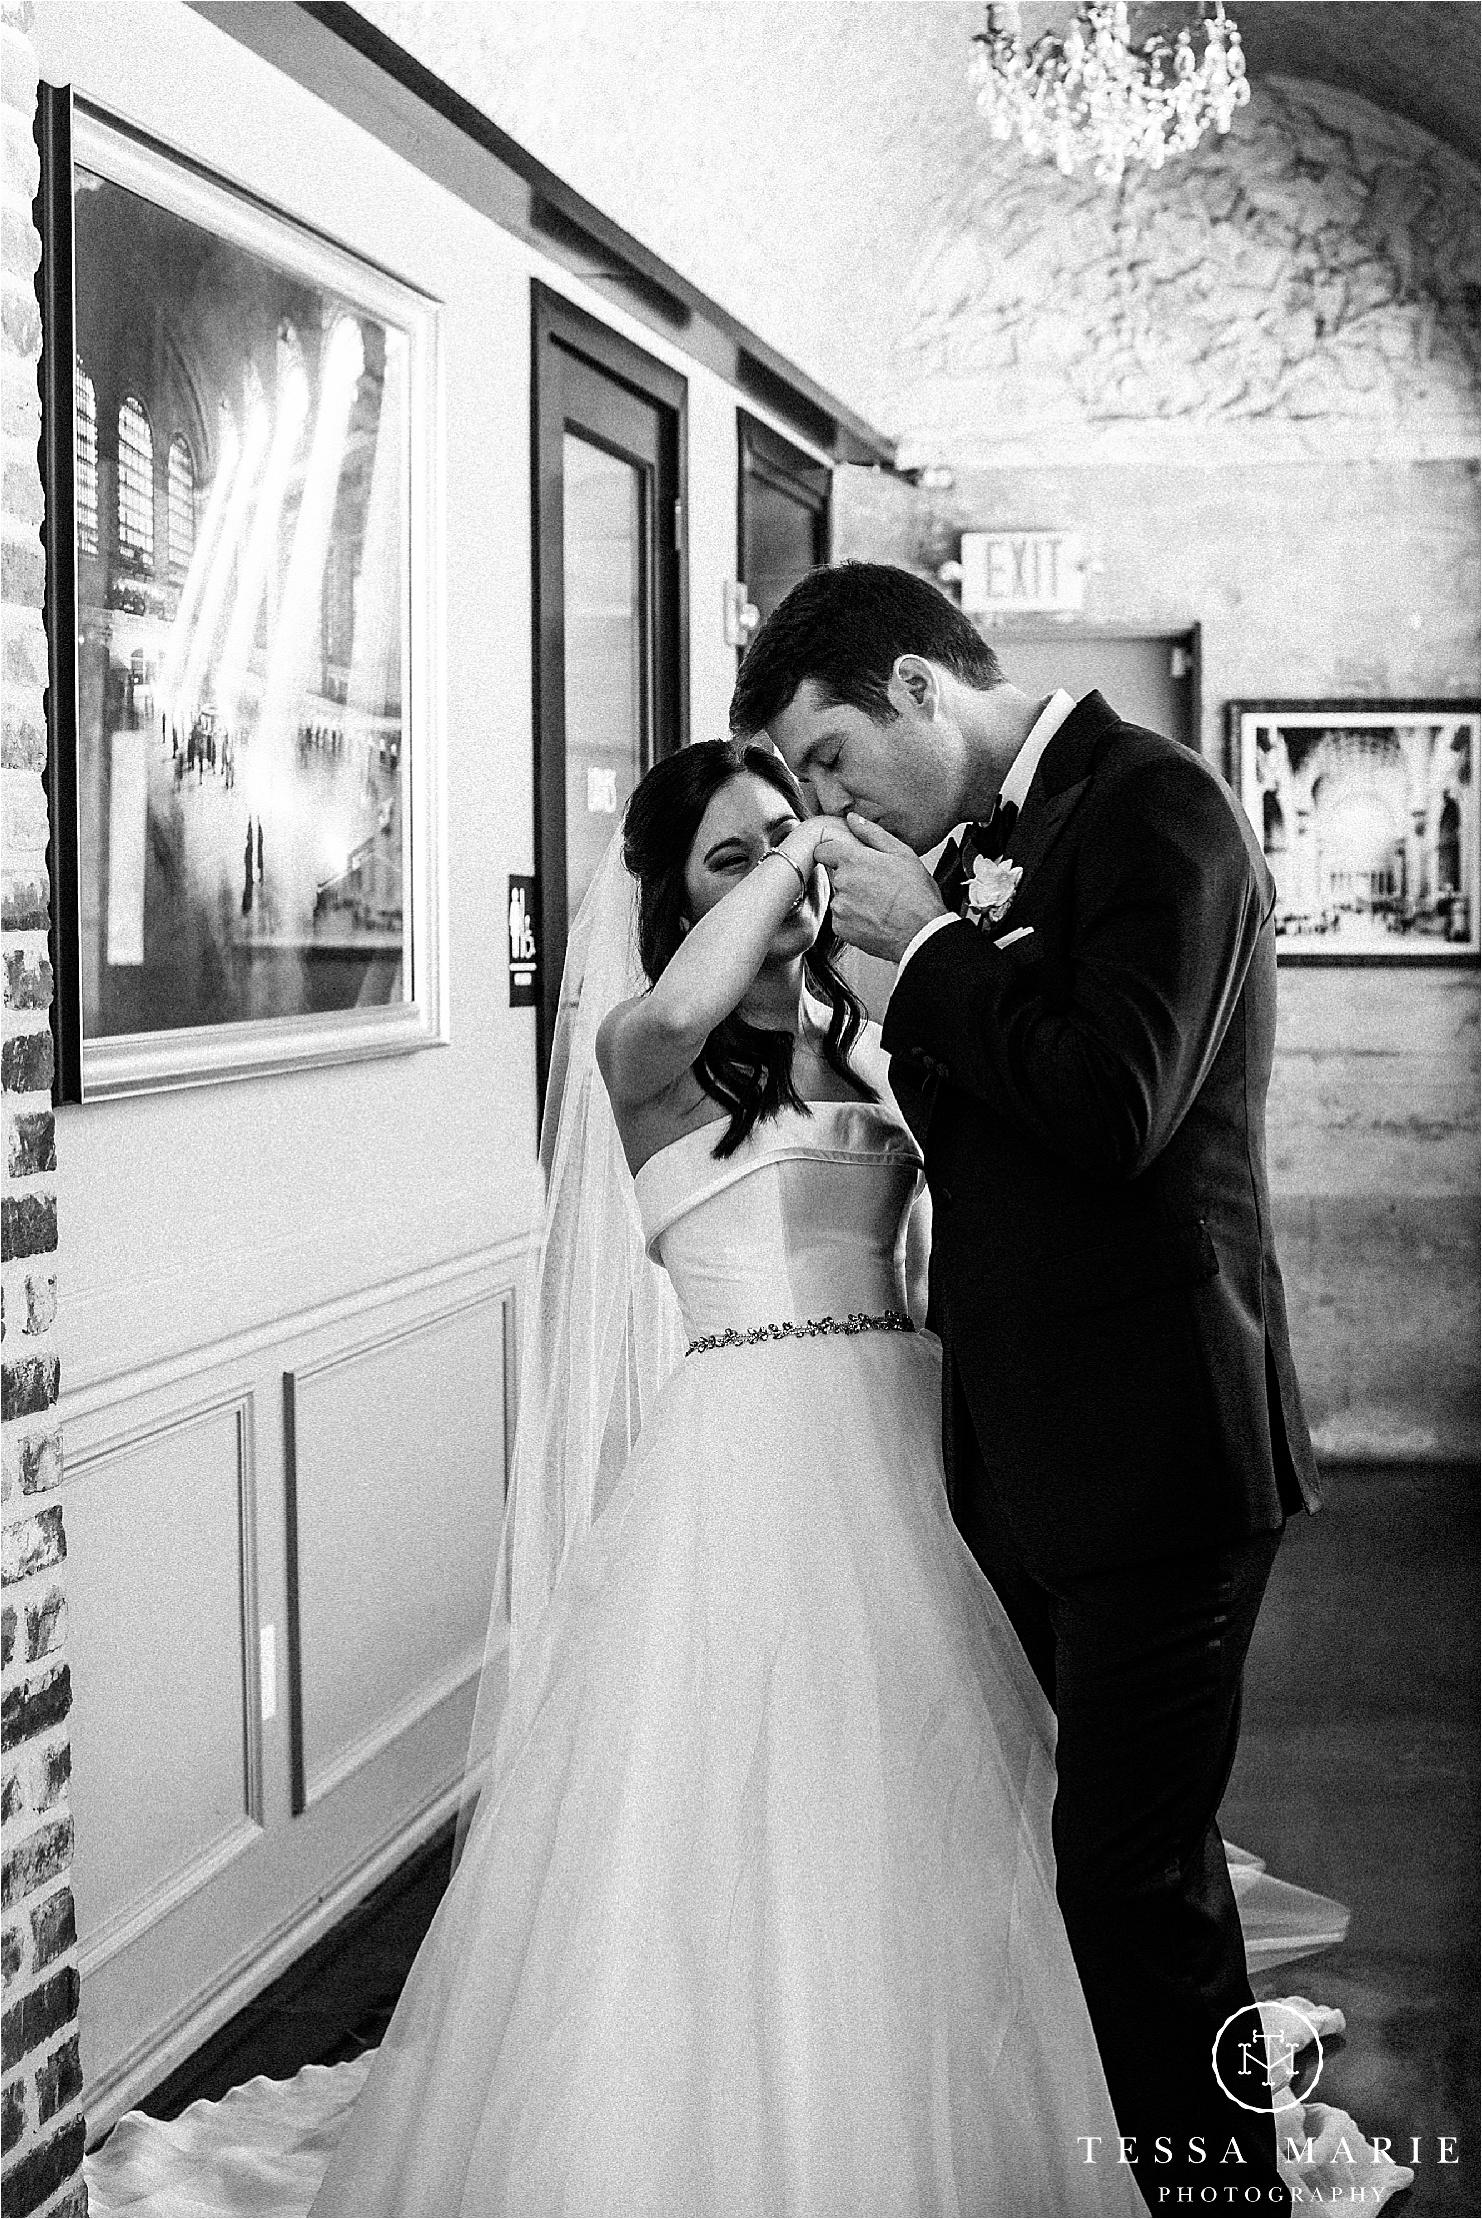 Tessa_marie_weddings_houston_wedding_photographer_The_astorian_0059.jpg